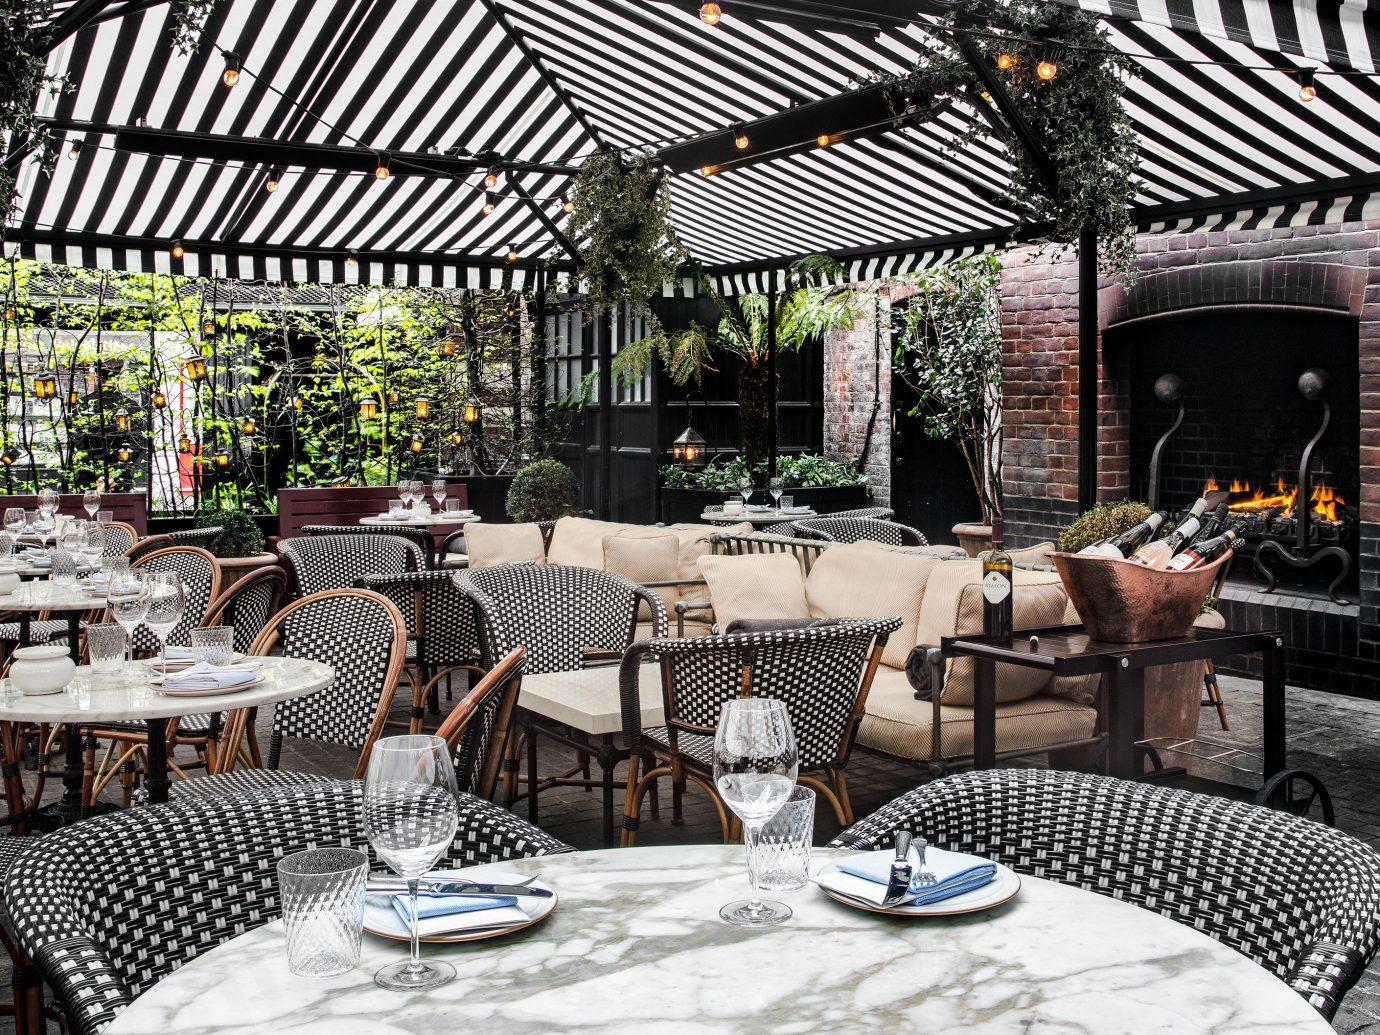 England europe London Luxury Travel Trip Ideas restaurant Patio outdoor structure table furniture interior design Resort